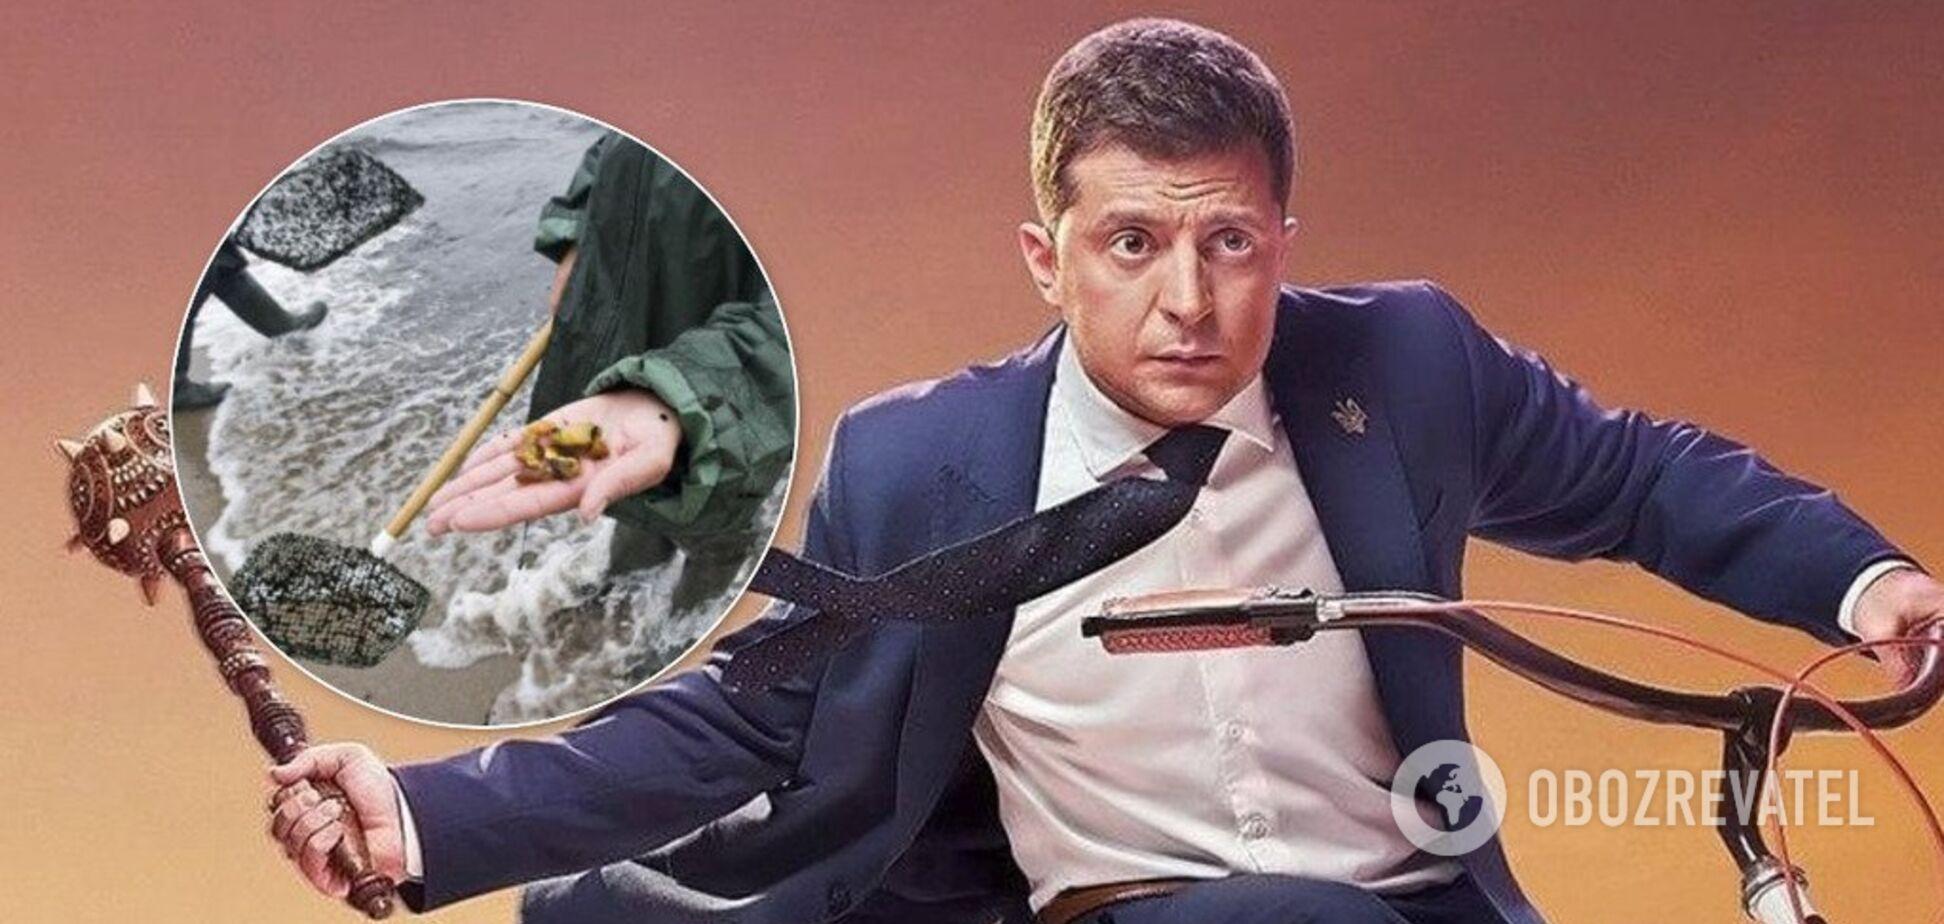 Зеленский приехал на разборки с янтарной мафией: полное видео